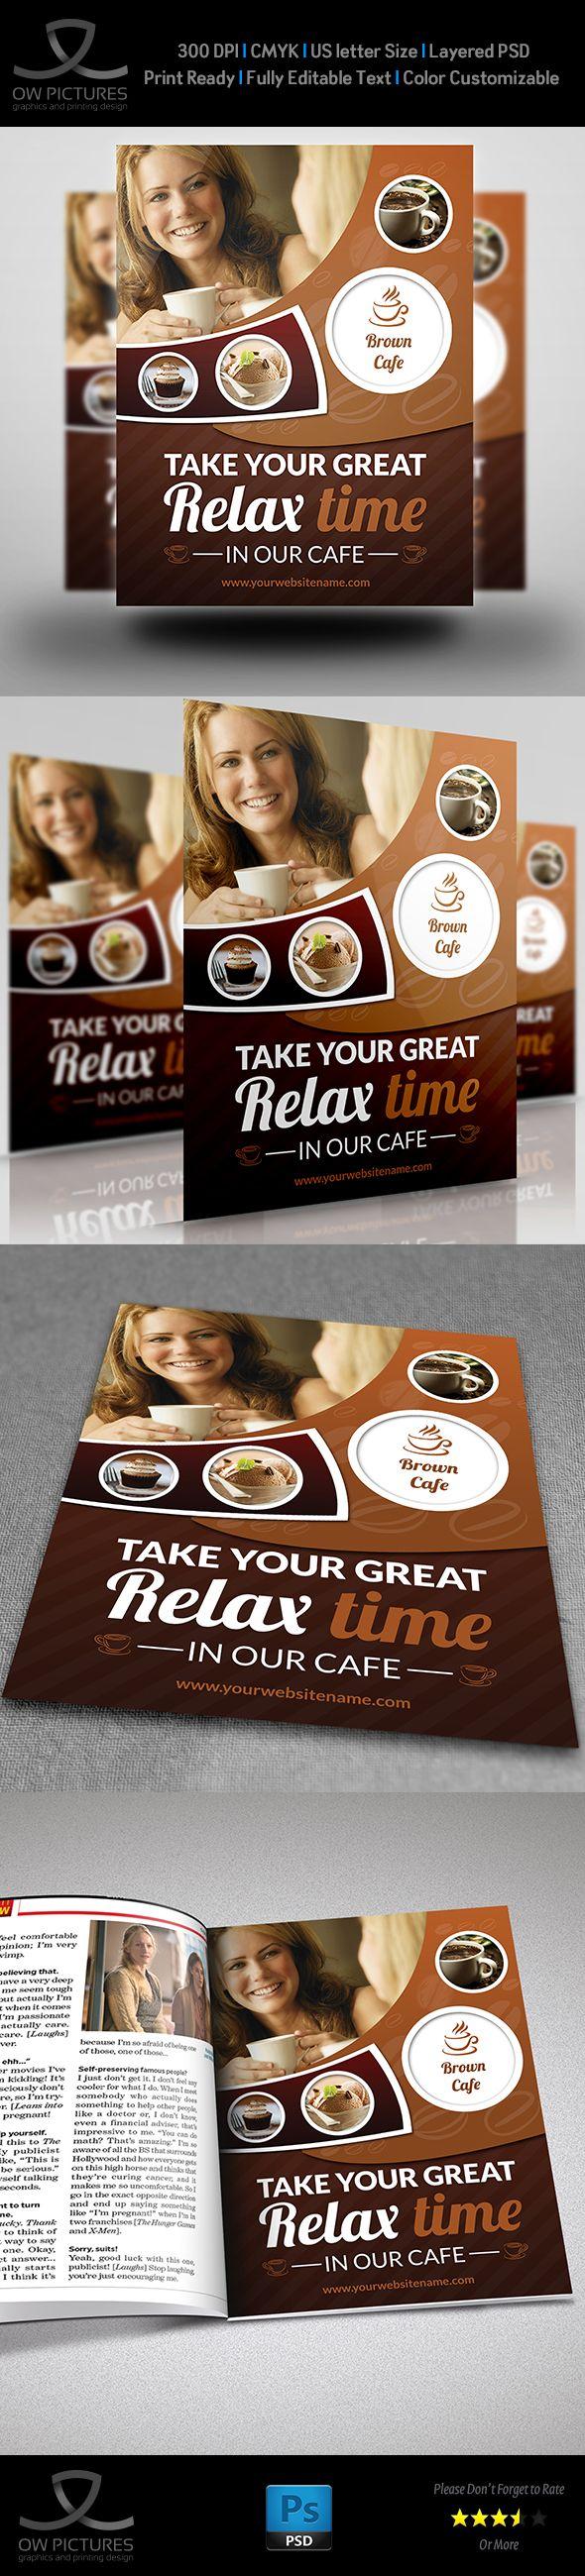 Cafe Restaurant Flyer Template Vol.3 on Behance